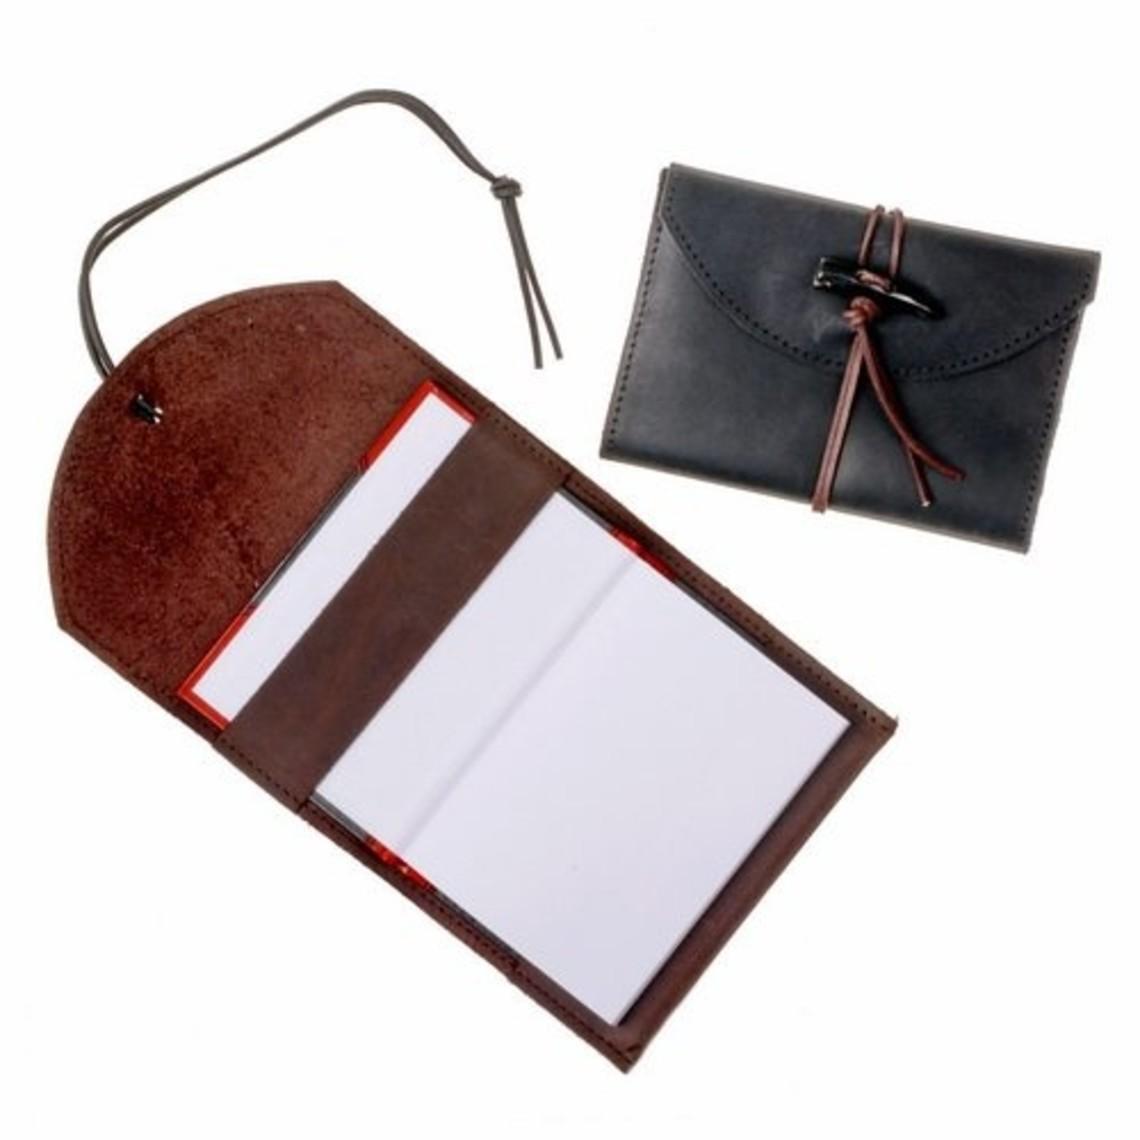 Notizbuch mit Lederbezug, schwarz, M.